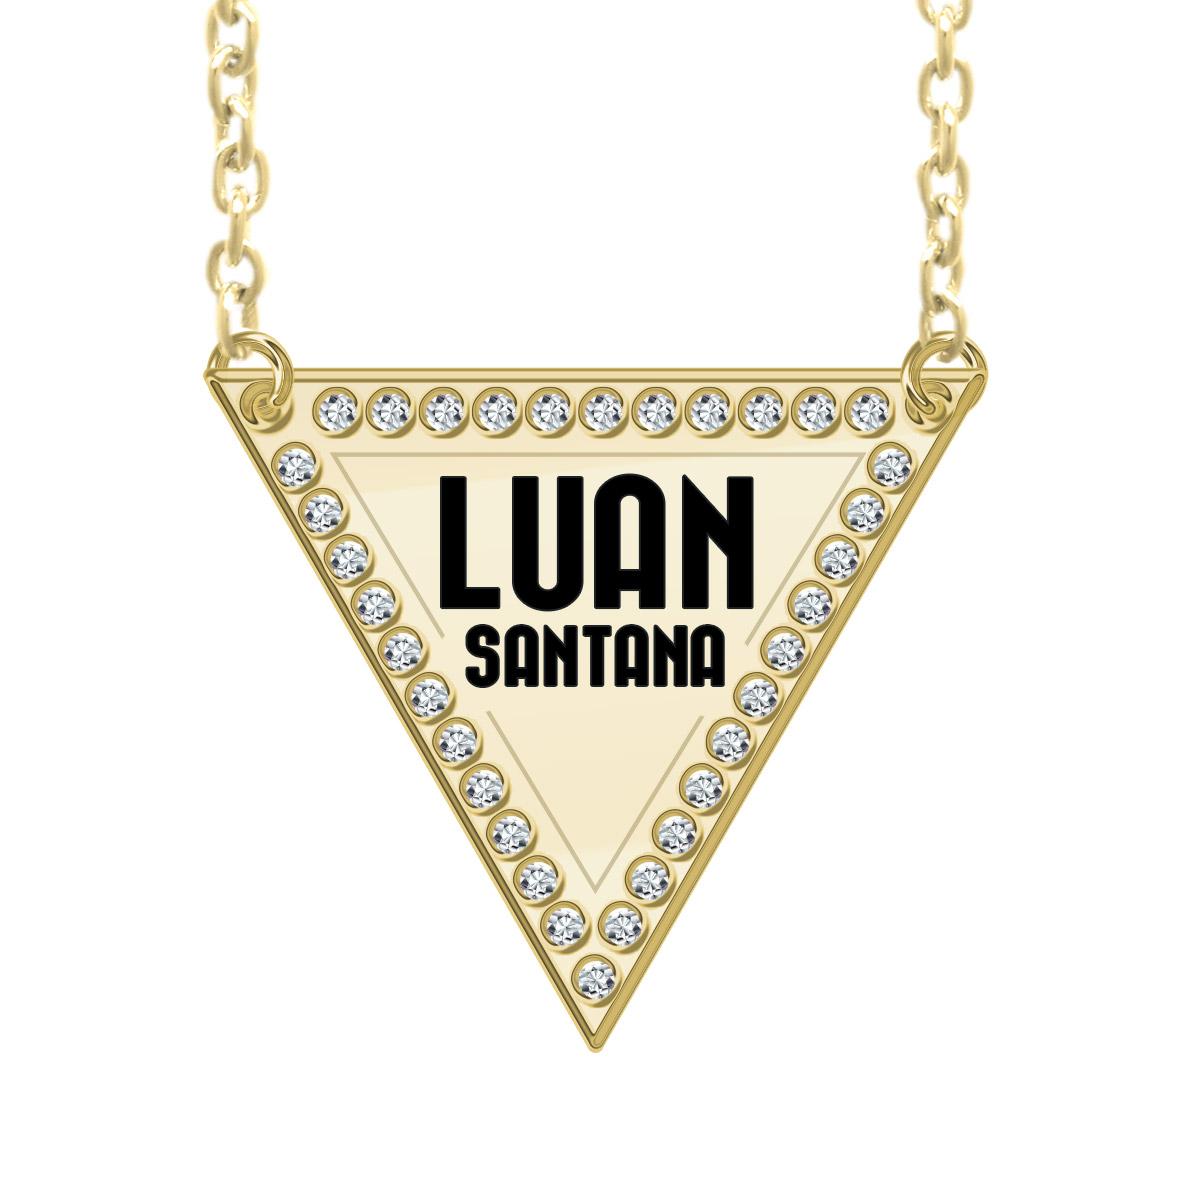 Colar Ouro Luan Santana Triângulo Logo